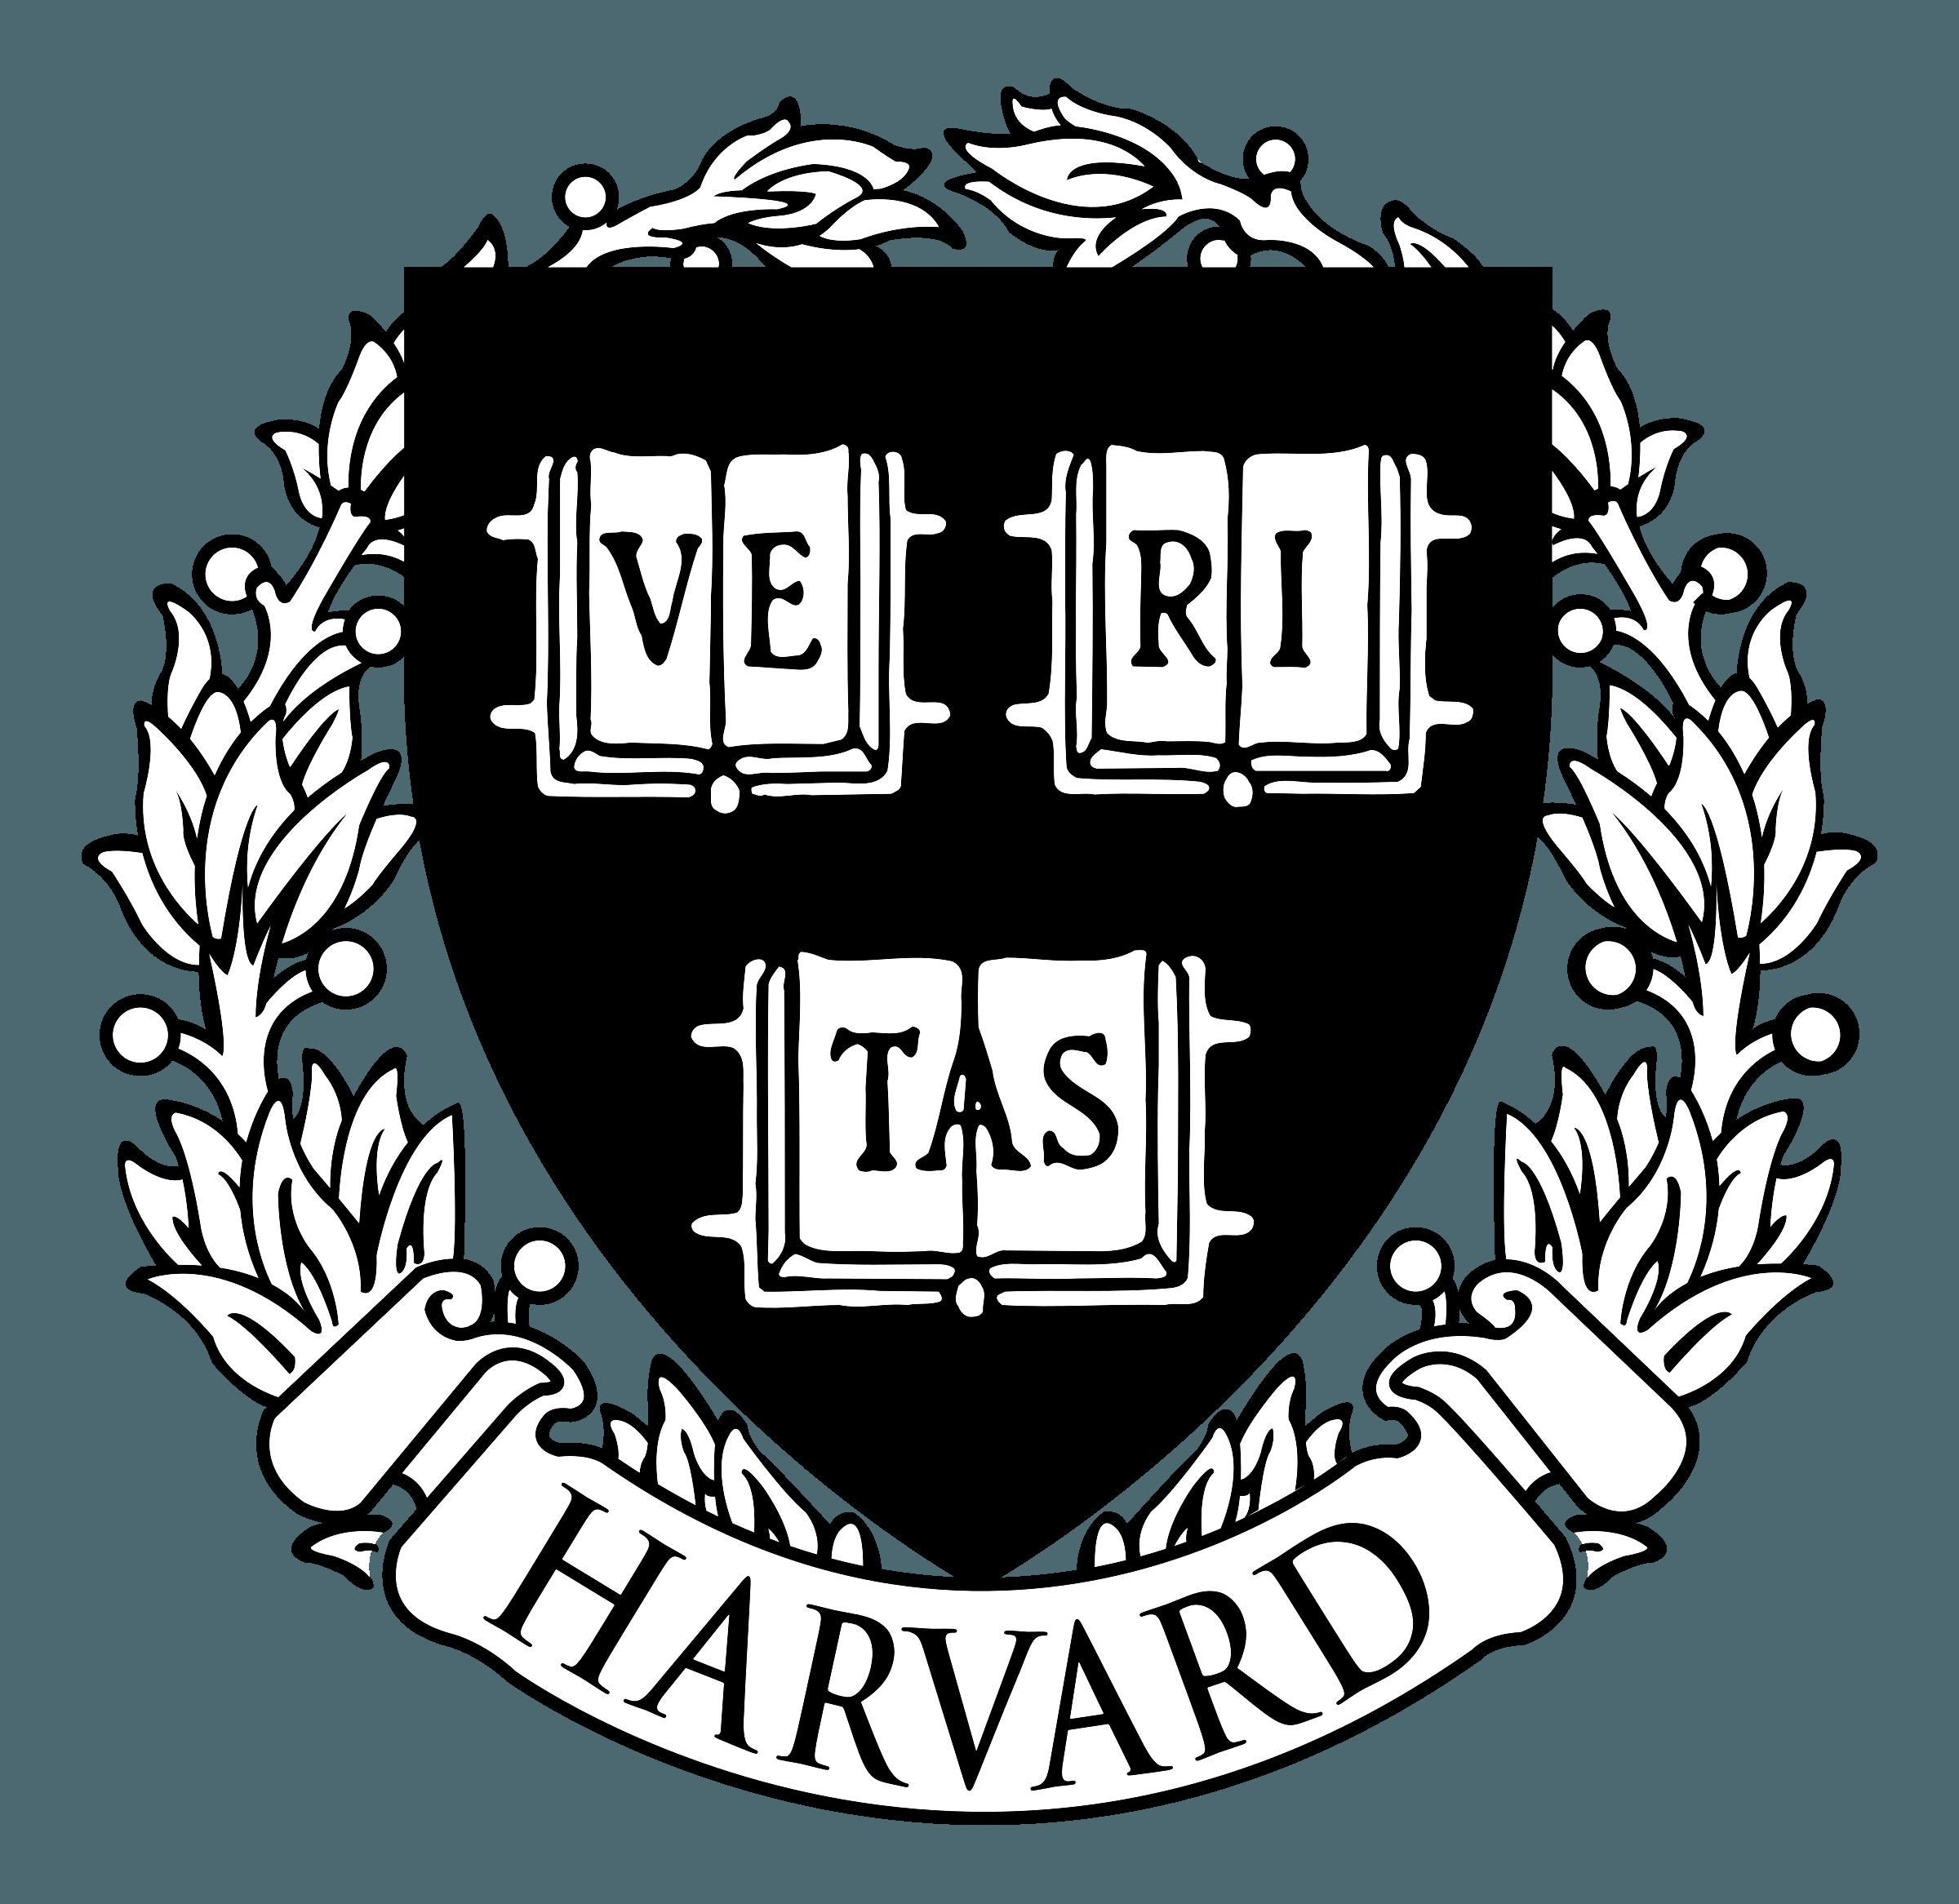 harvard logo png transparent amp svg vector freebie supply